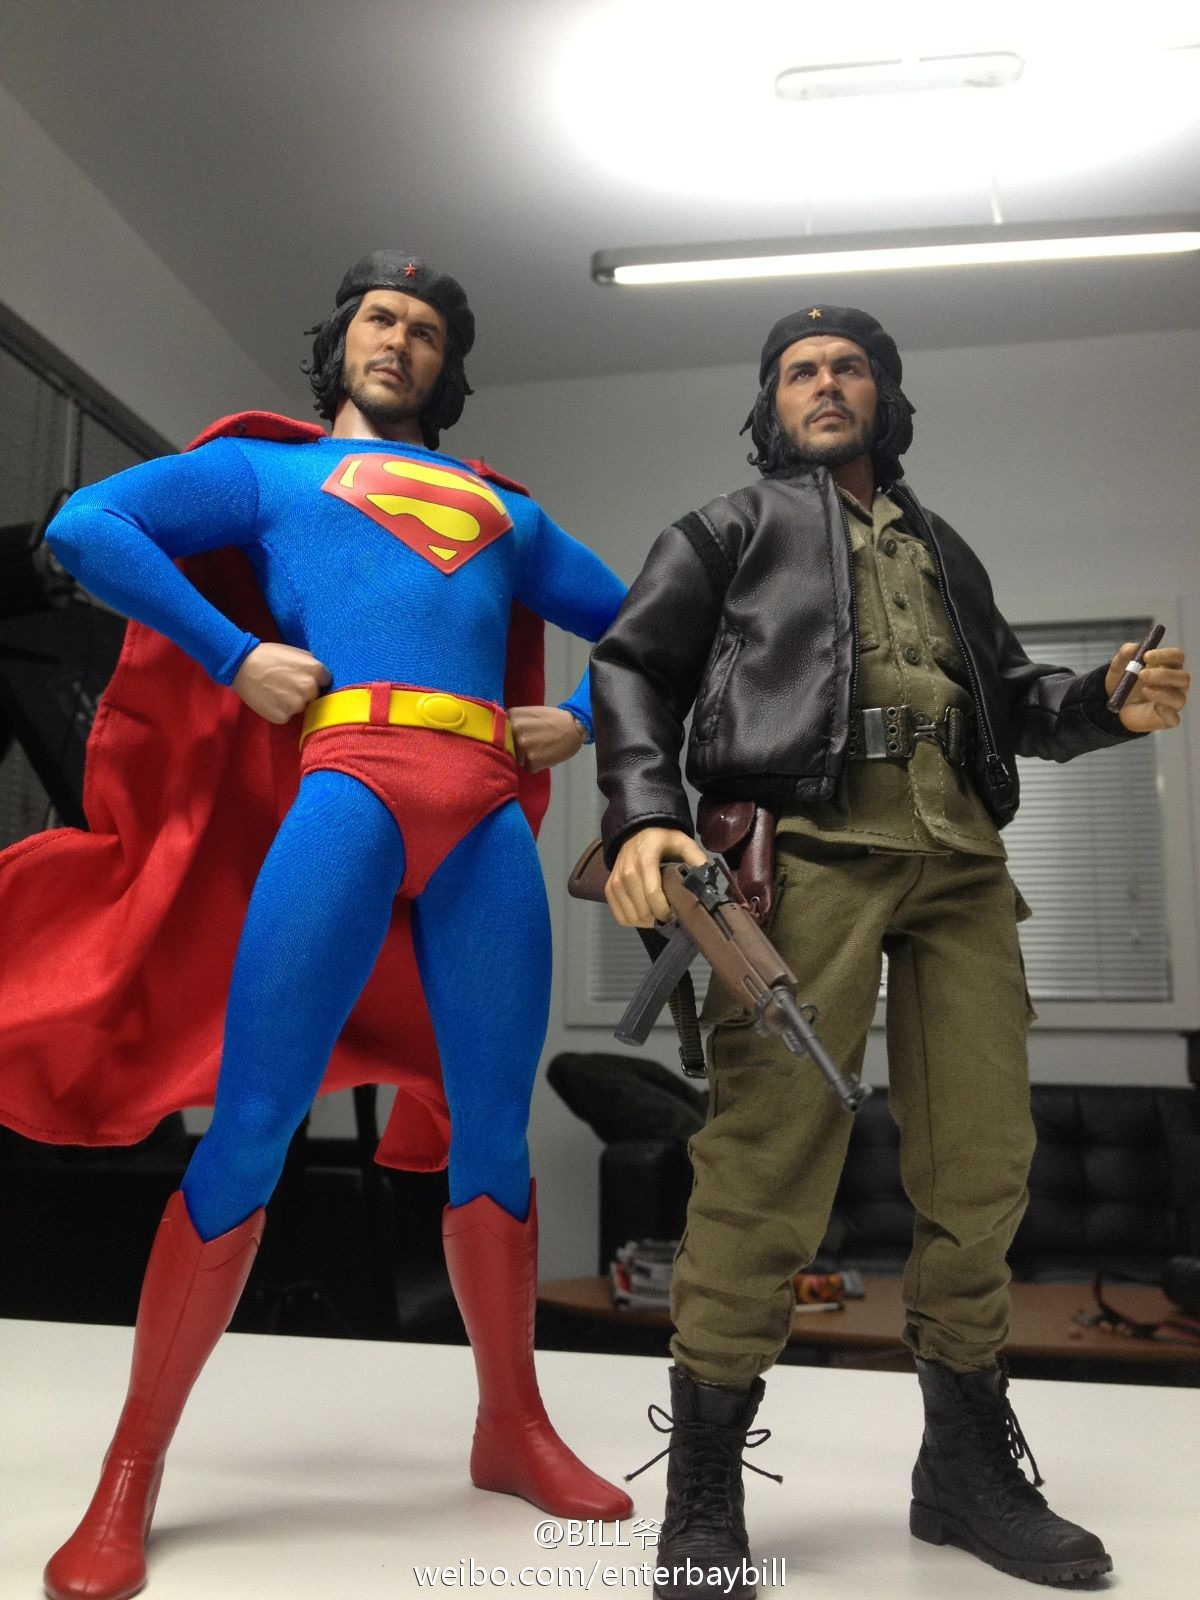 [Enterbay] Che Guevara - 1/6 Scale Collectible Figure - Página 2 69464edejw1dqhv6tip8fj